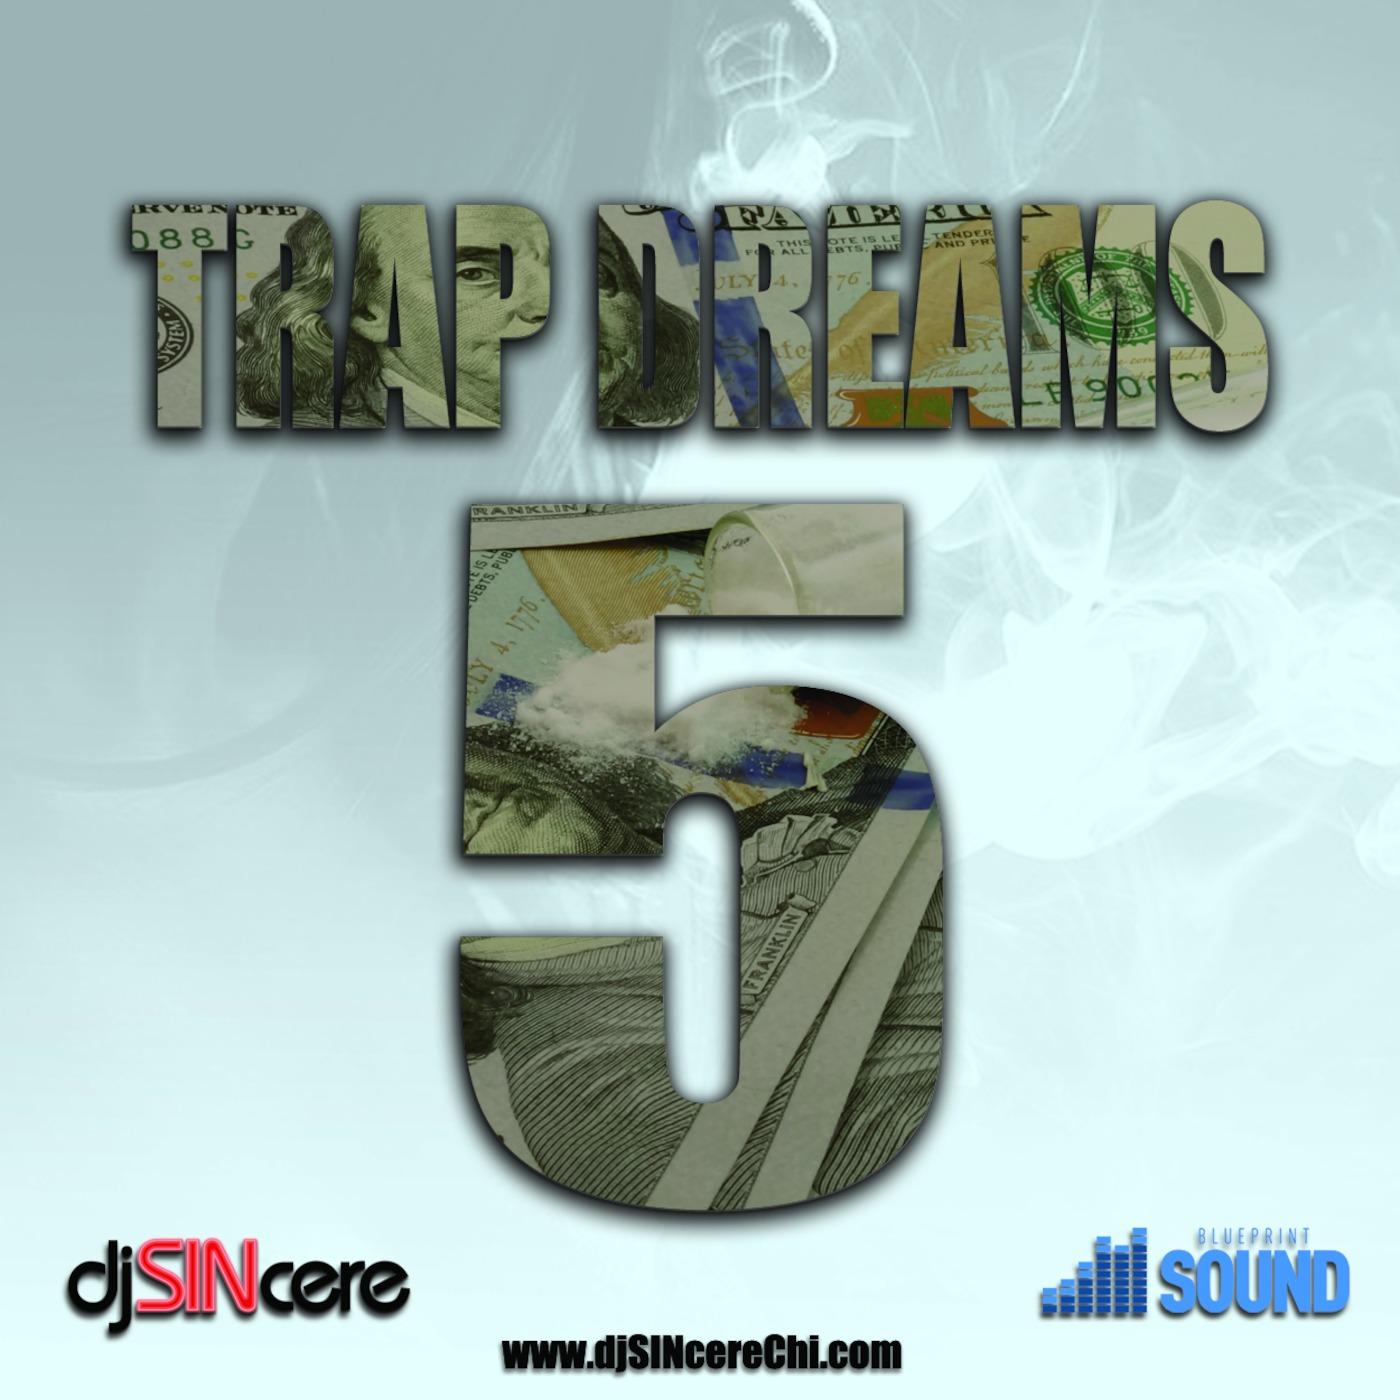 DjSINcere's Trap Dreams 5 DjSINcere podcast